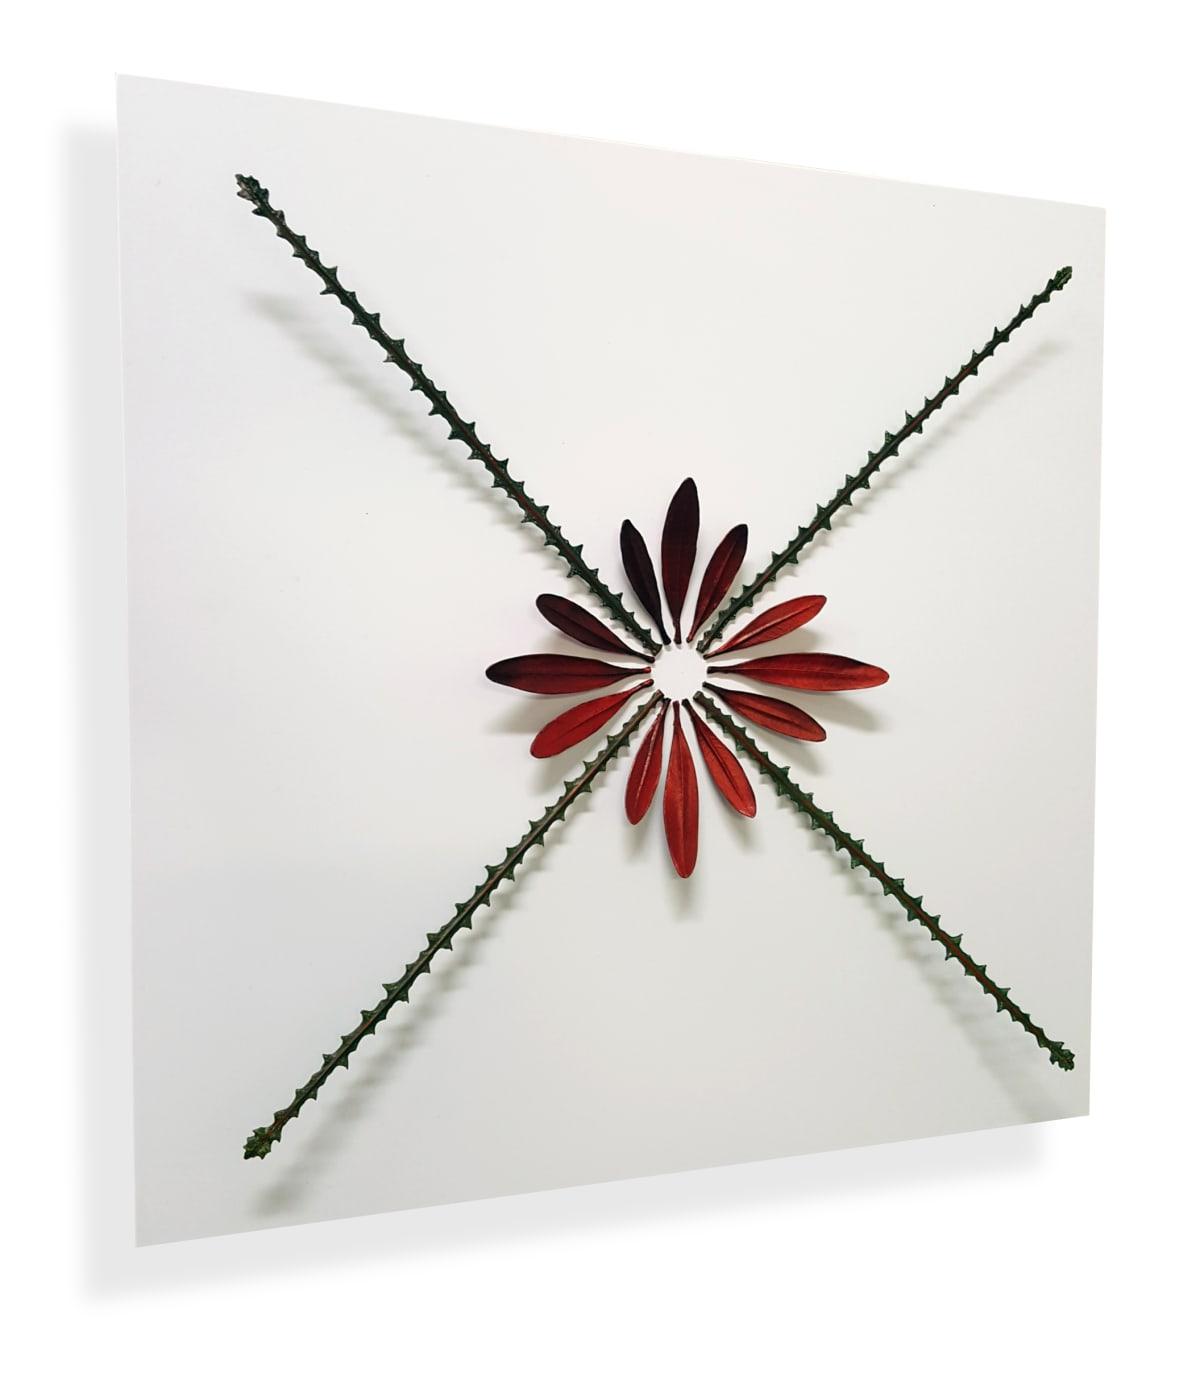 Elizabeth THOMSON  Casa Pintoresca Study III, 2015-16  Mixed media  17.7 x 17.7 in 45 x 45 cm